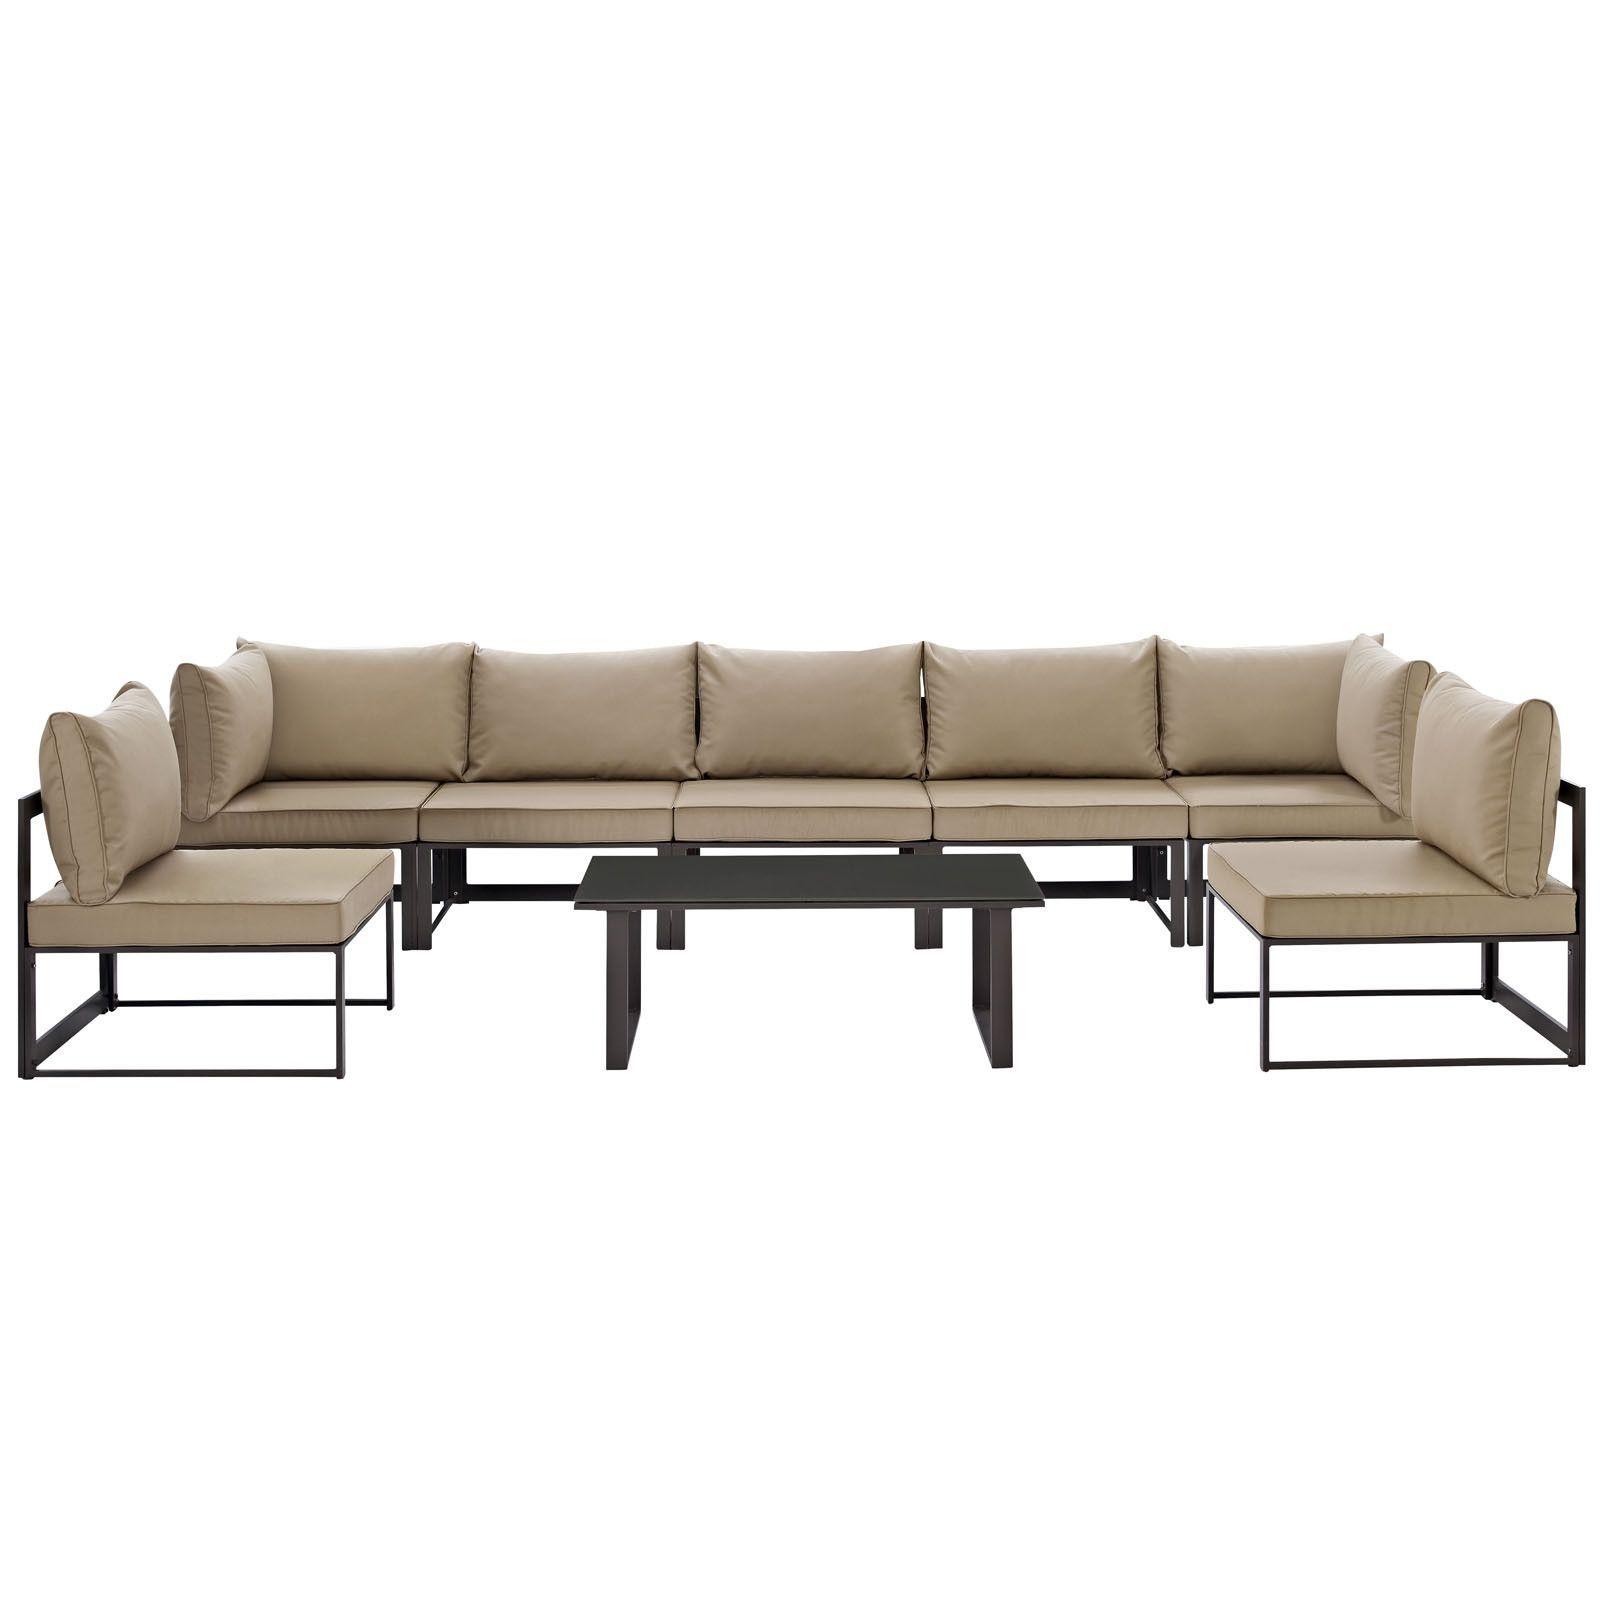 Fortuna 8 Piece Outdoor Patio Sectional Sofa Set at Harvey